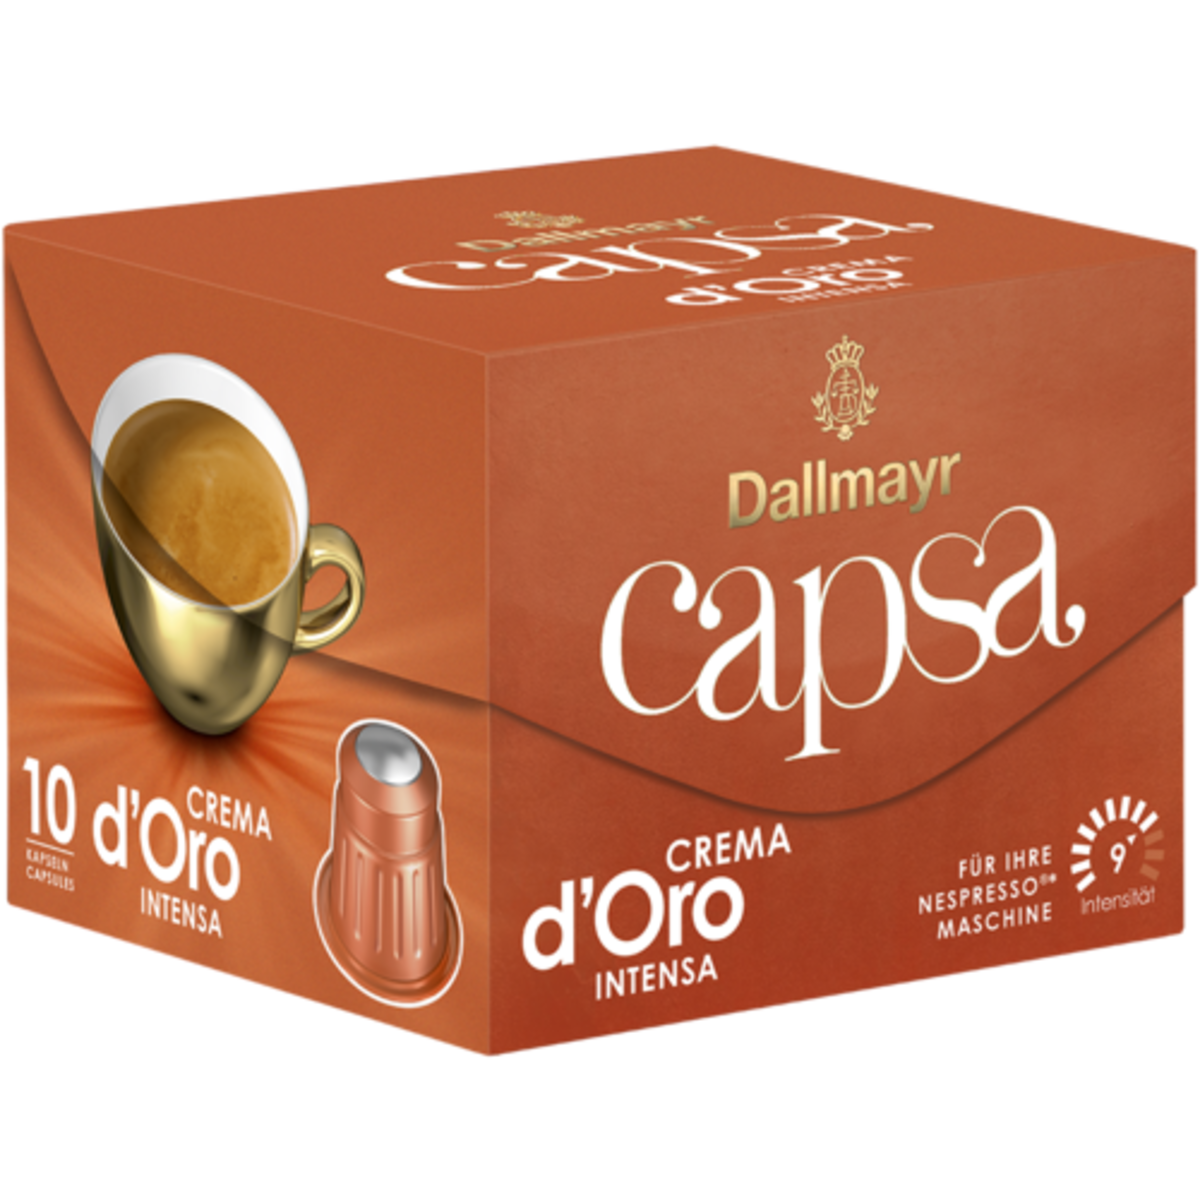 Dallmayr capsa Crema D'oro Intensa  Nespresso съвместими капсули